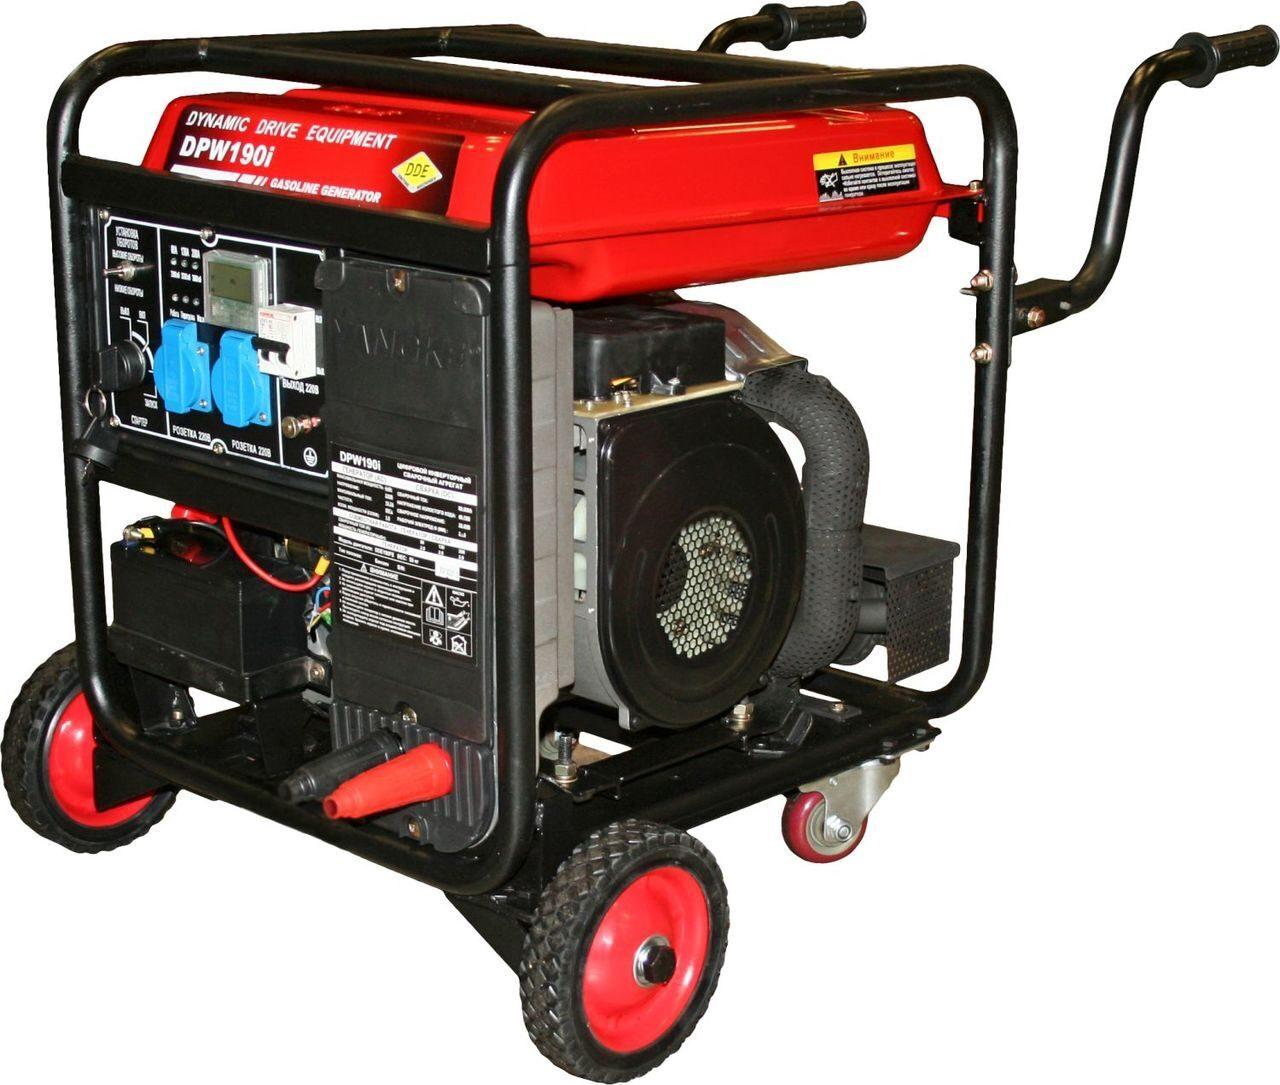 инструкция по эксплуатации электростанция dde dpg 1101 i